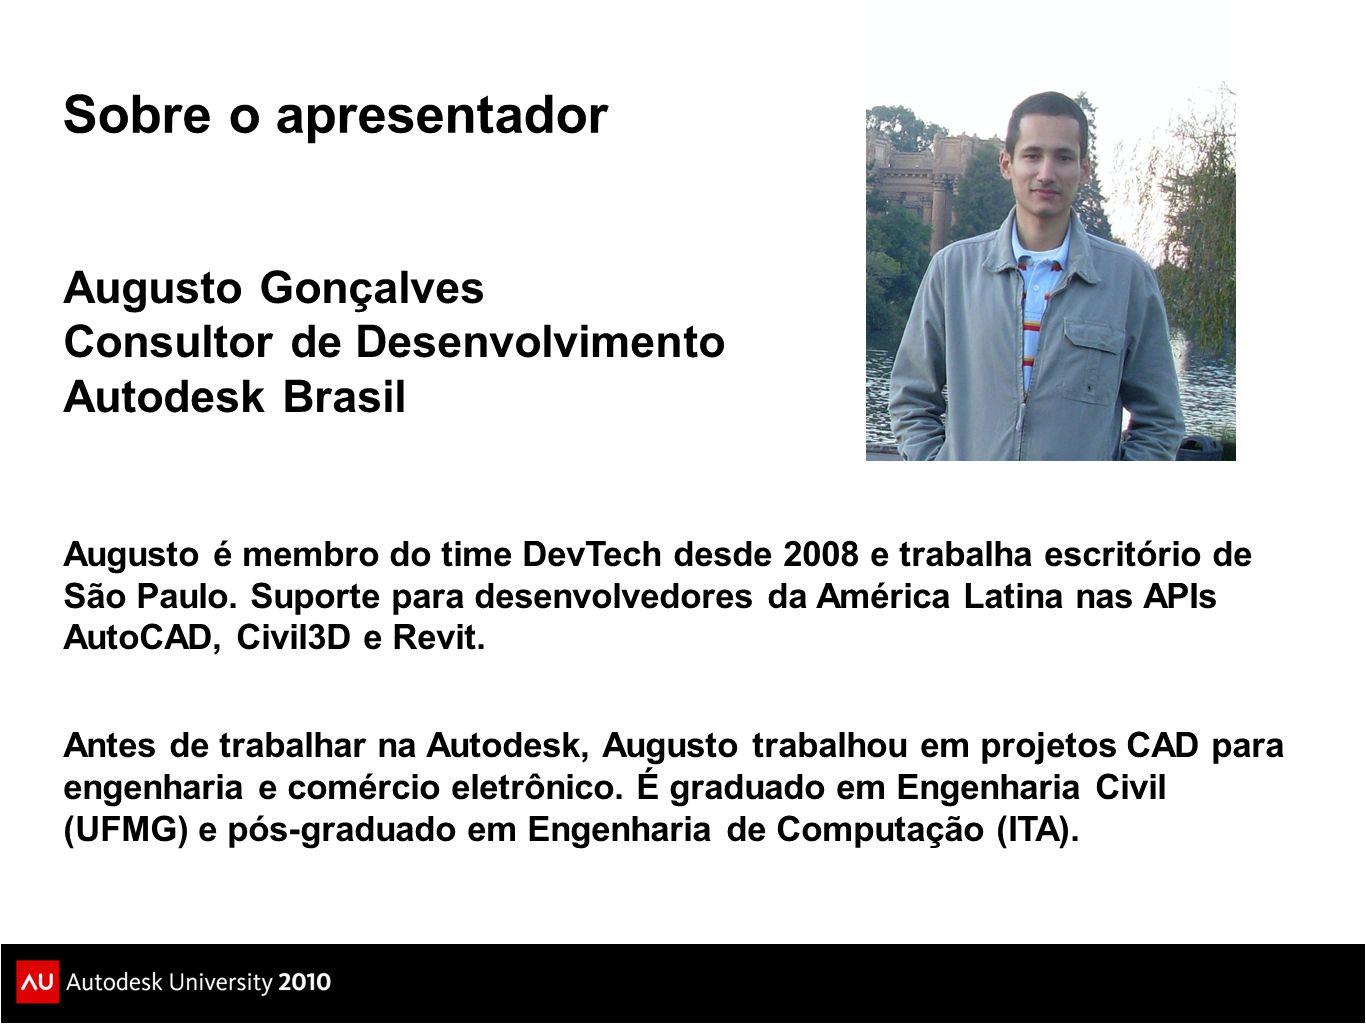 Sobre o apresentador Augusto Gonçalves Consultor de Desenvolvimento Autodesk Brasil.